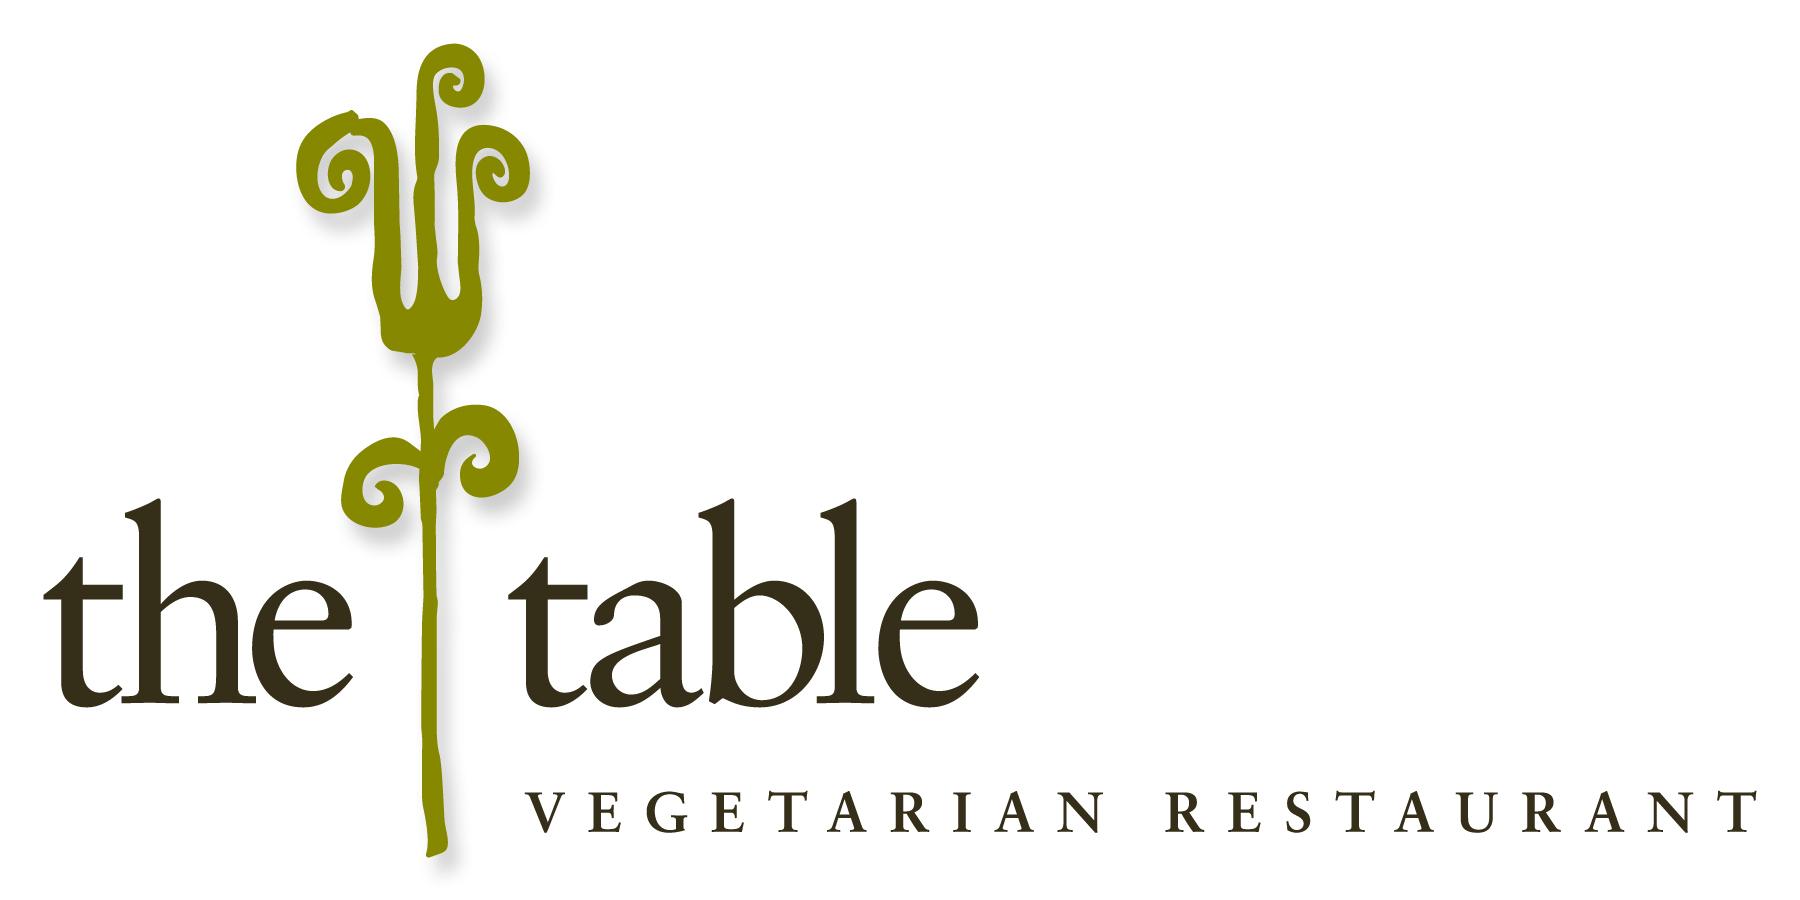 January 2011 national capital vegetarian association for Table table logo